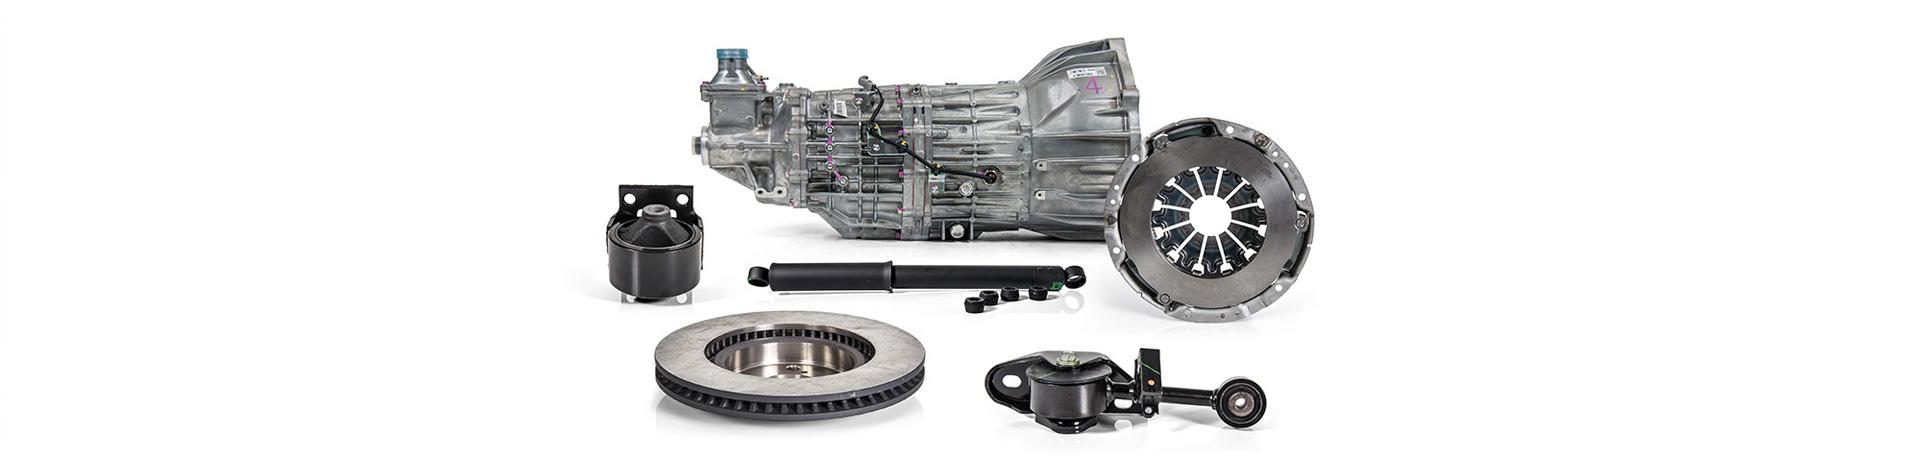 Toyota Genuine Parts Waverley | Waverley Toyota